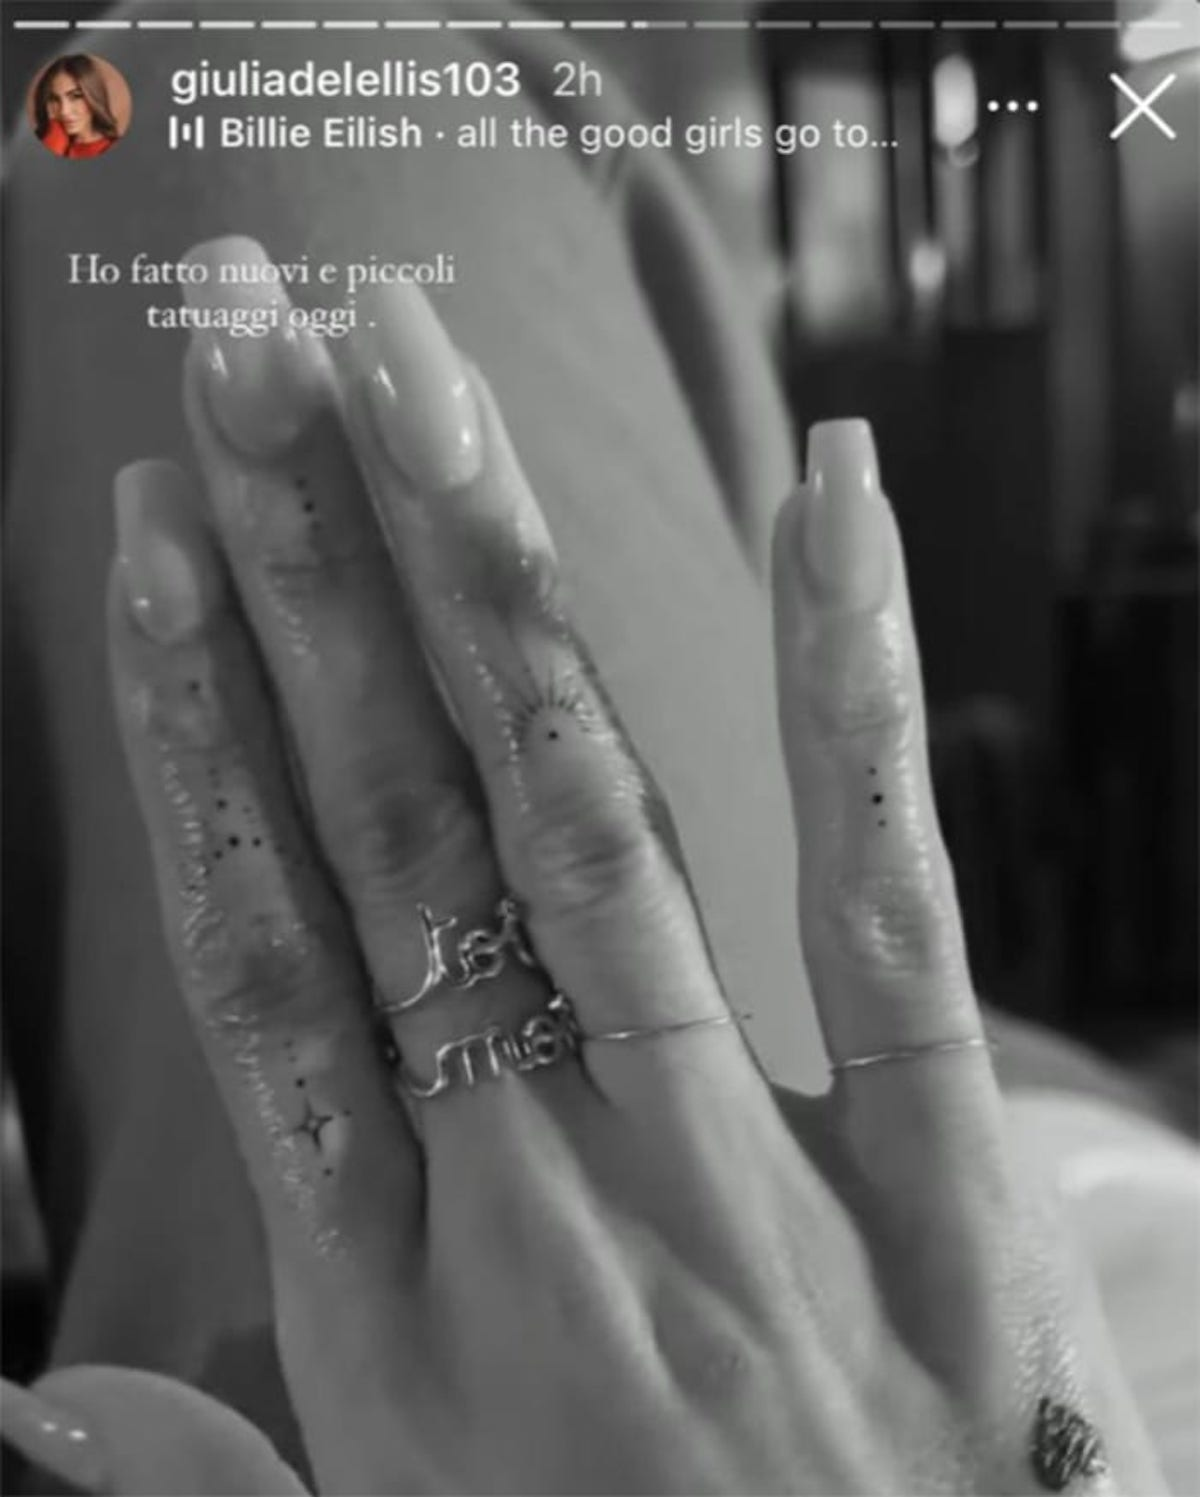 Tattoo alla mano Giulia De Lellis